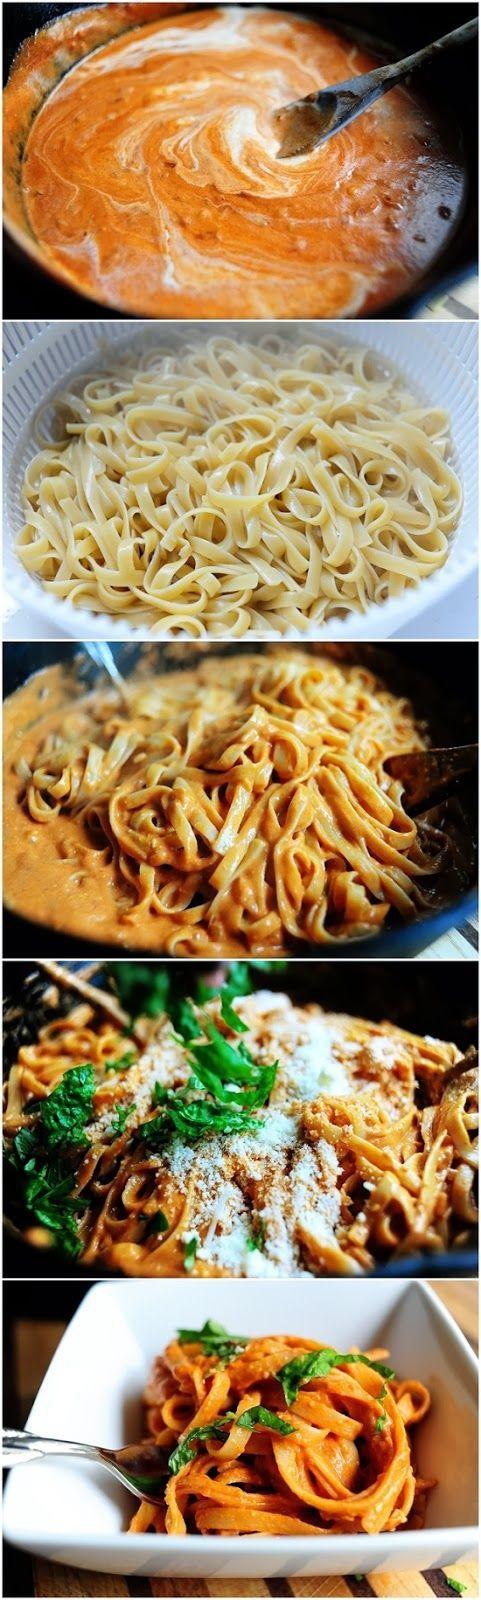 Pasta with Tomato Cream Sauce. Perfect simple dinner.